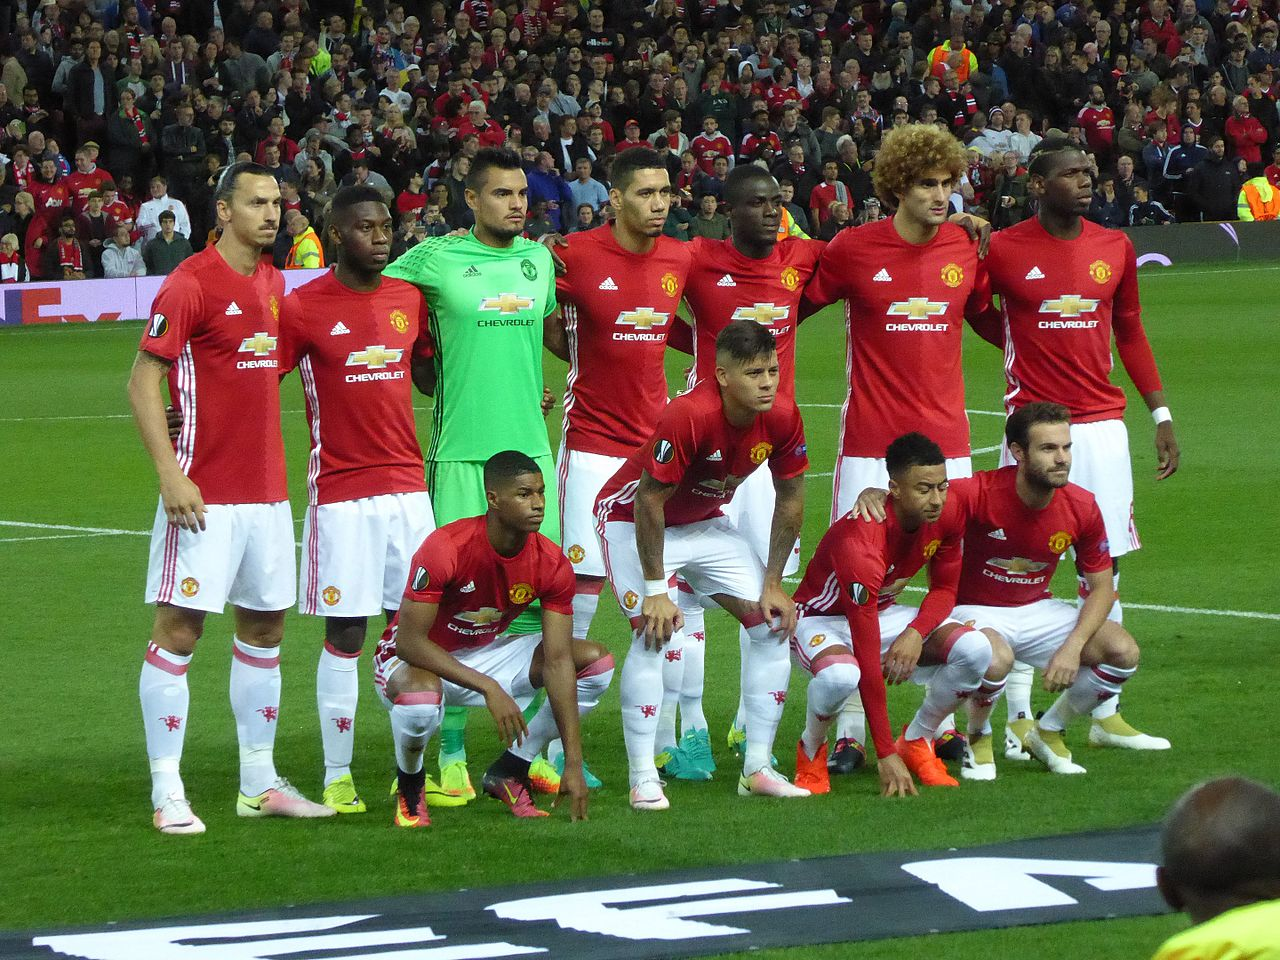 Man U Picture: File:Manchester United V Zorya Luhansk, September 2016 (10